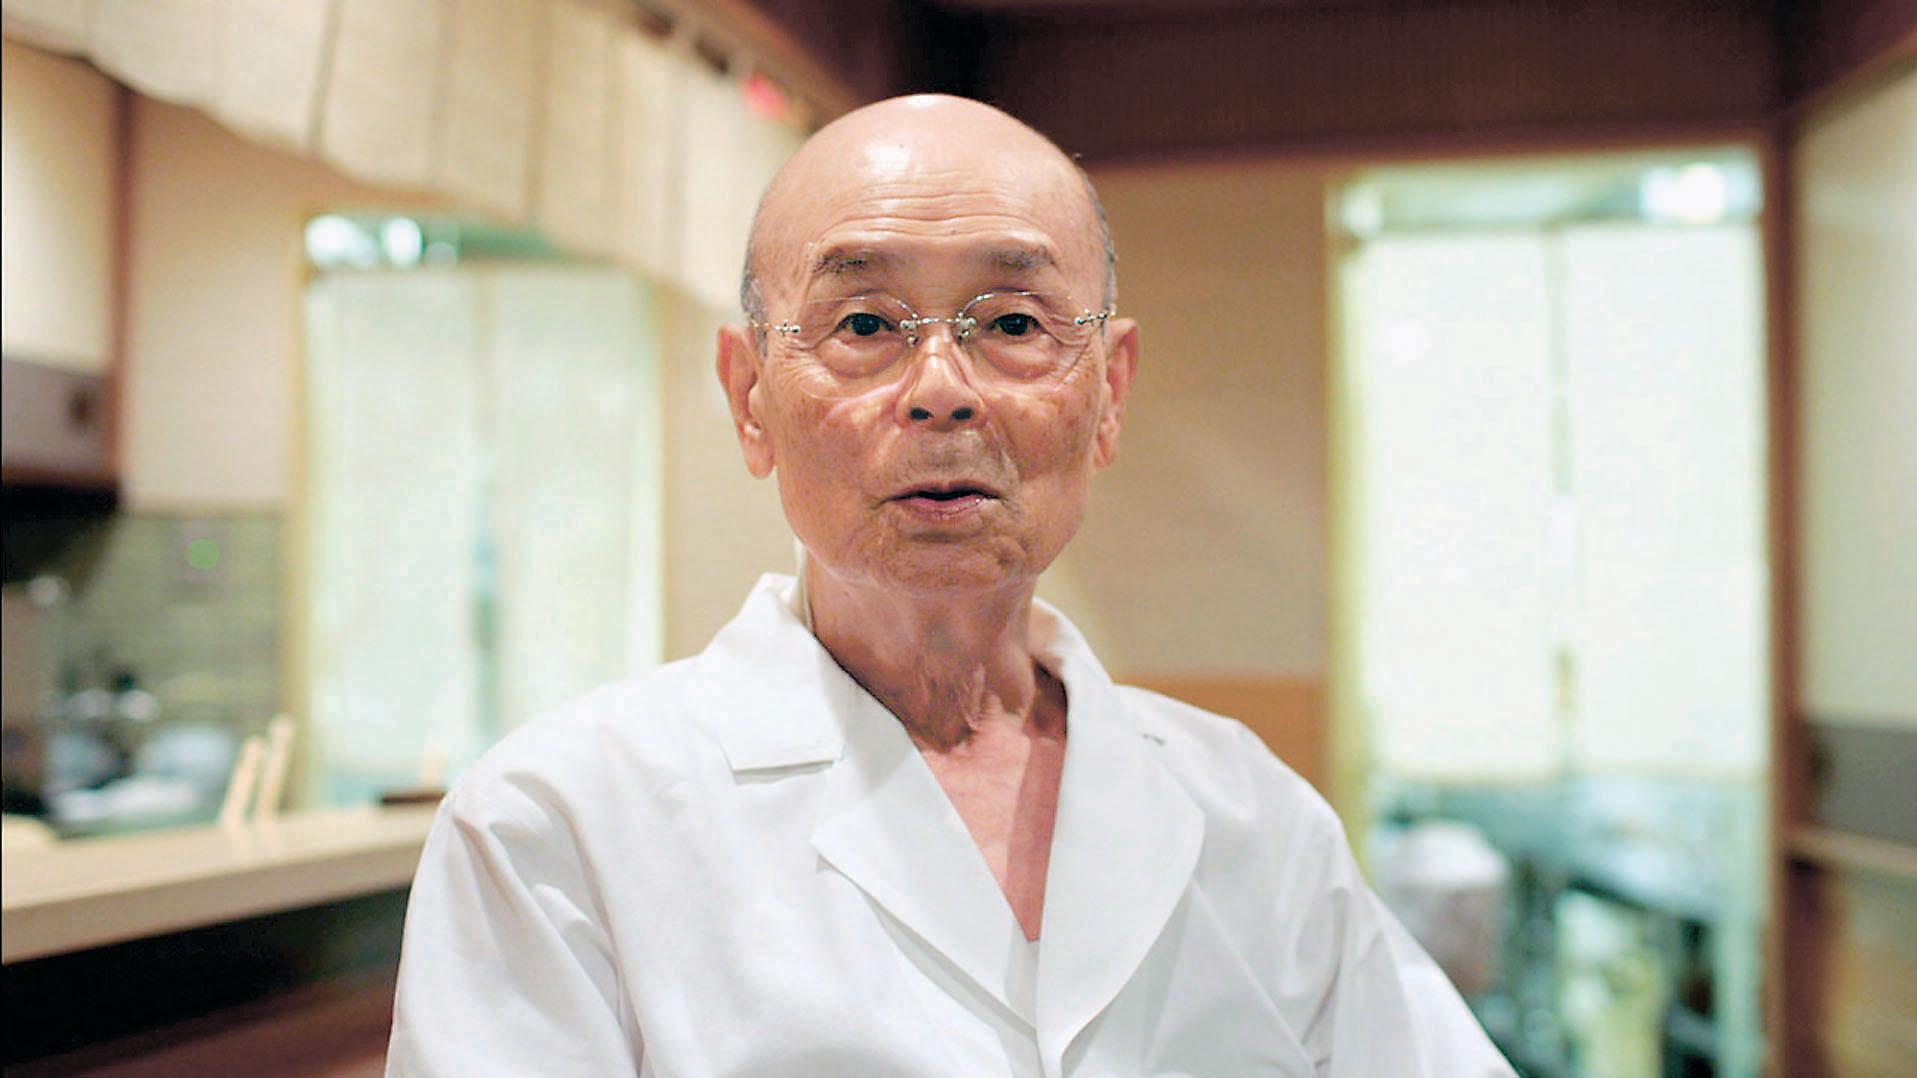 Jiro Ono - Biography